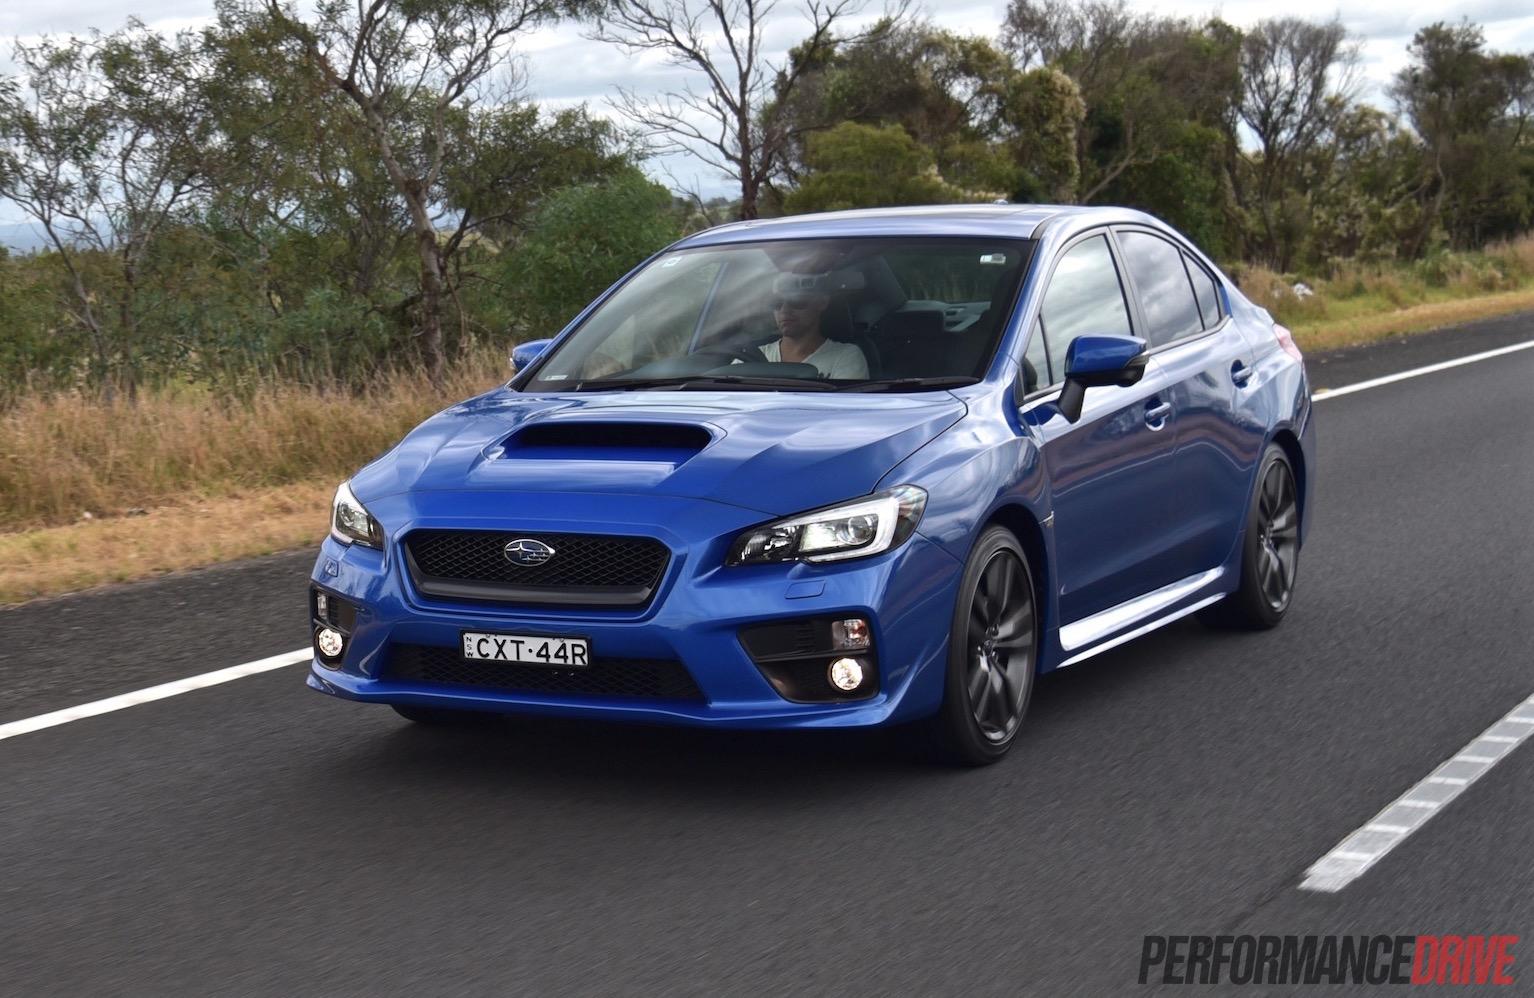 2016 Subaru Wrx Review Manual Amp Cvt Auto Video